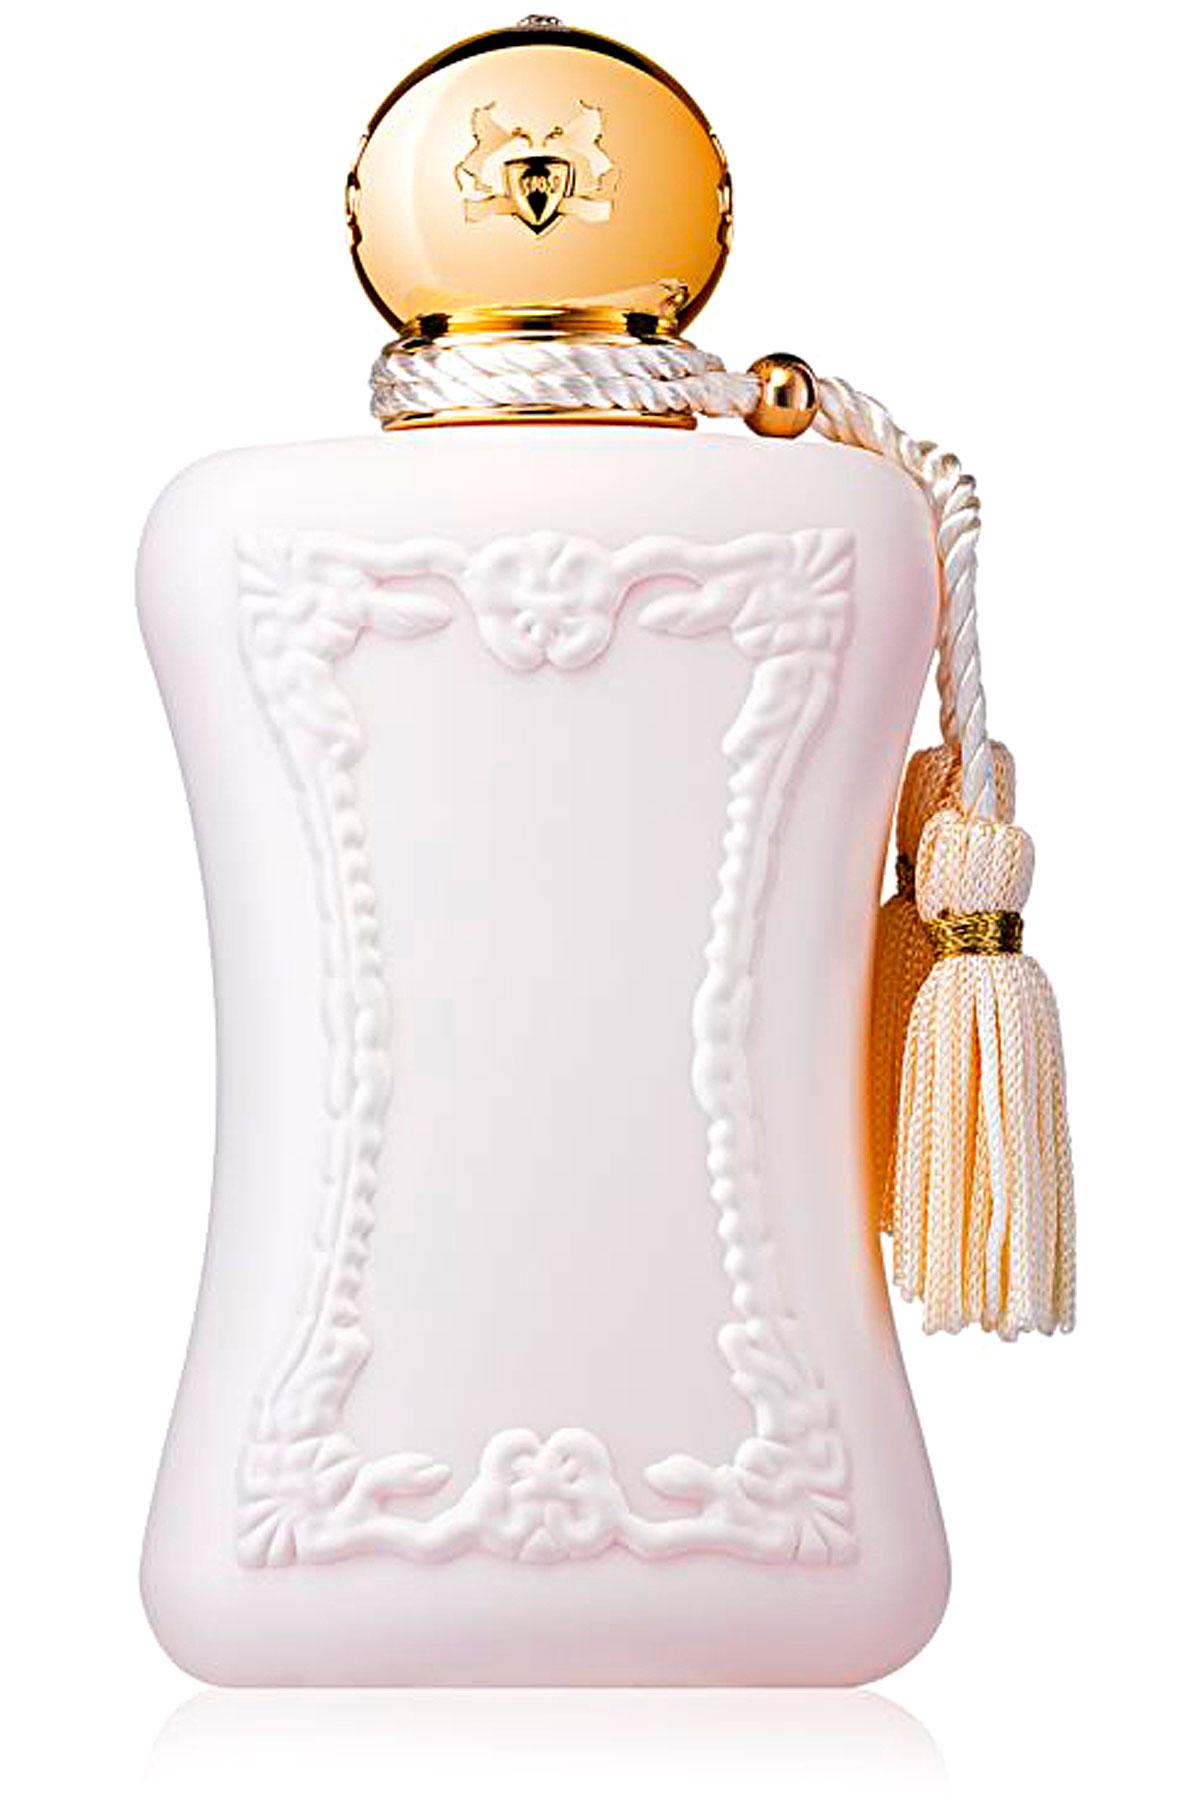 Parfums de Marly Fragrances for Women, Sedbury - Eau De Parfum - 75 Ml, 2019, 75 ml